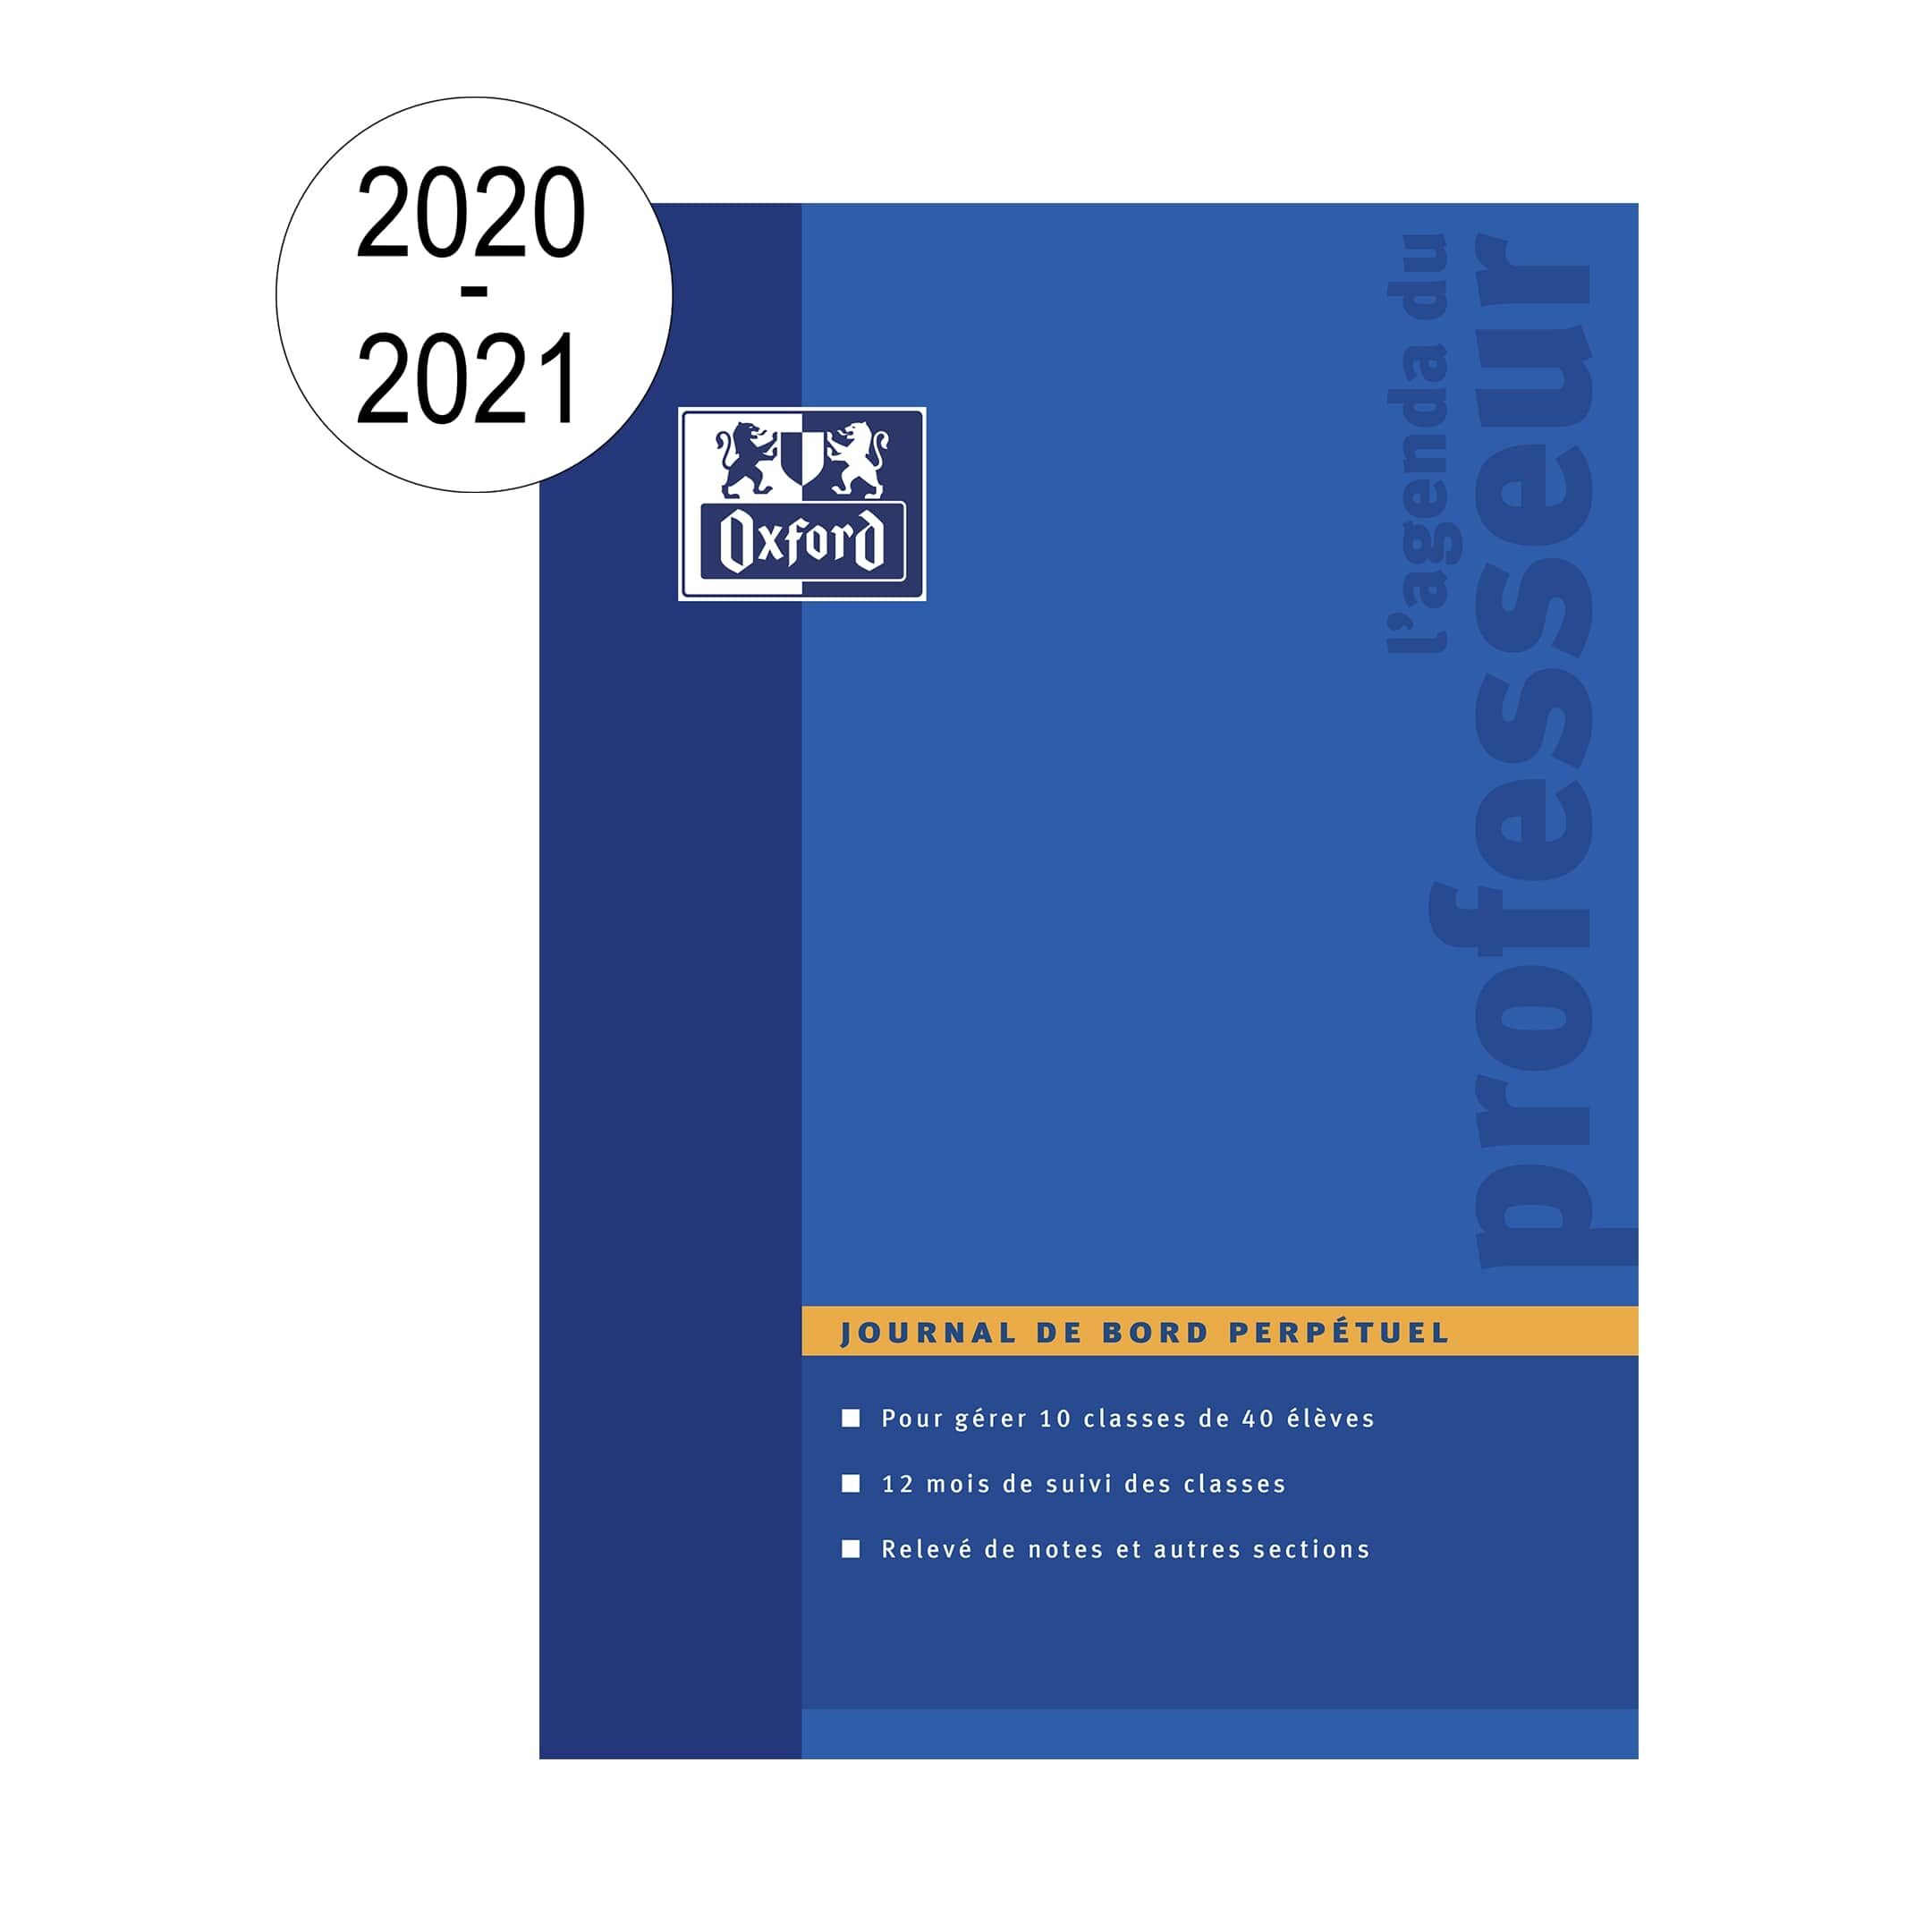 Agenda Oxford Teacher - Perpétuel - 21 x 29,7 cm - bleu - Hamelin